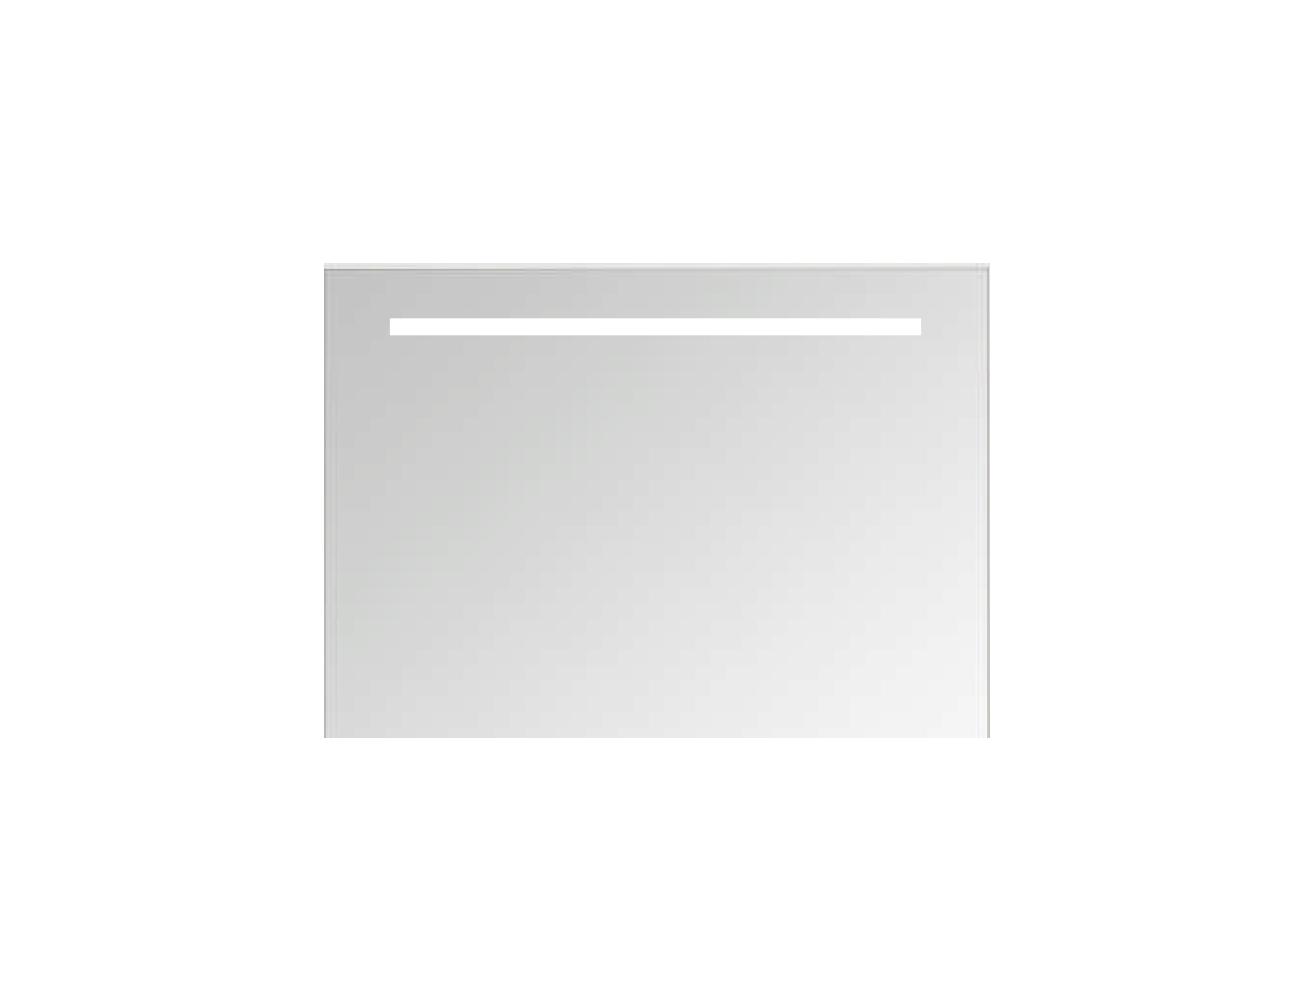 Basic spiegel op alu frame met geintegreerde led verlichting - 1200x30mm (bxd)